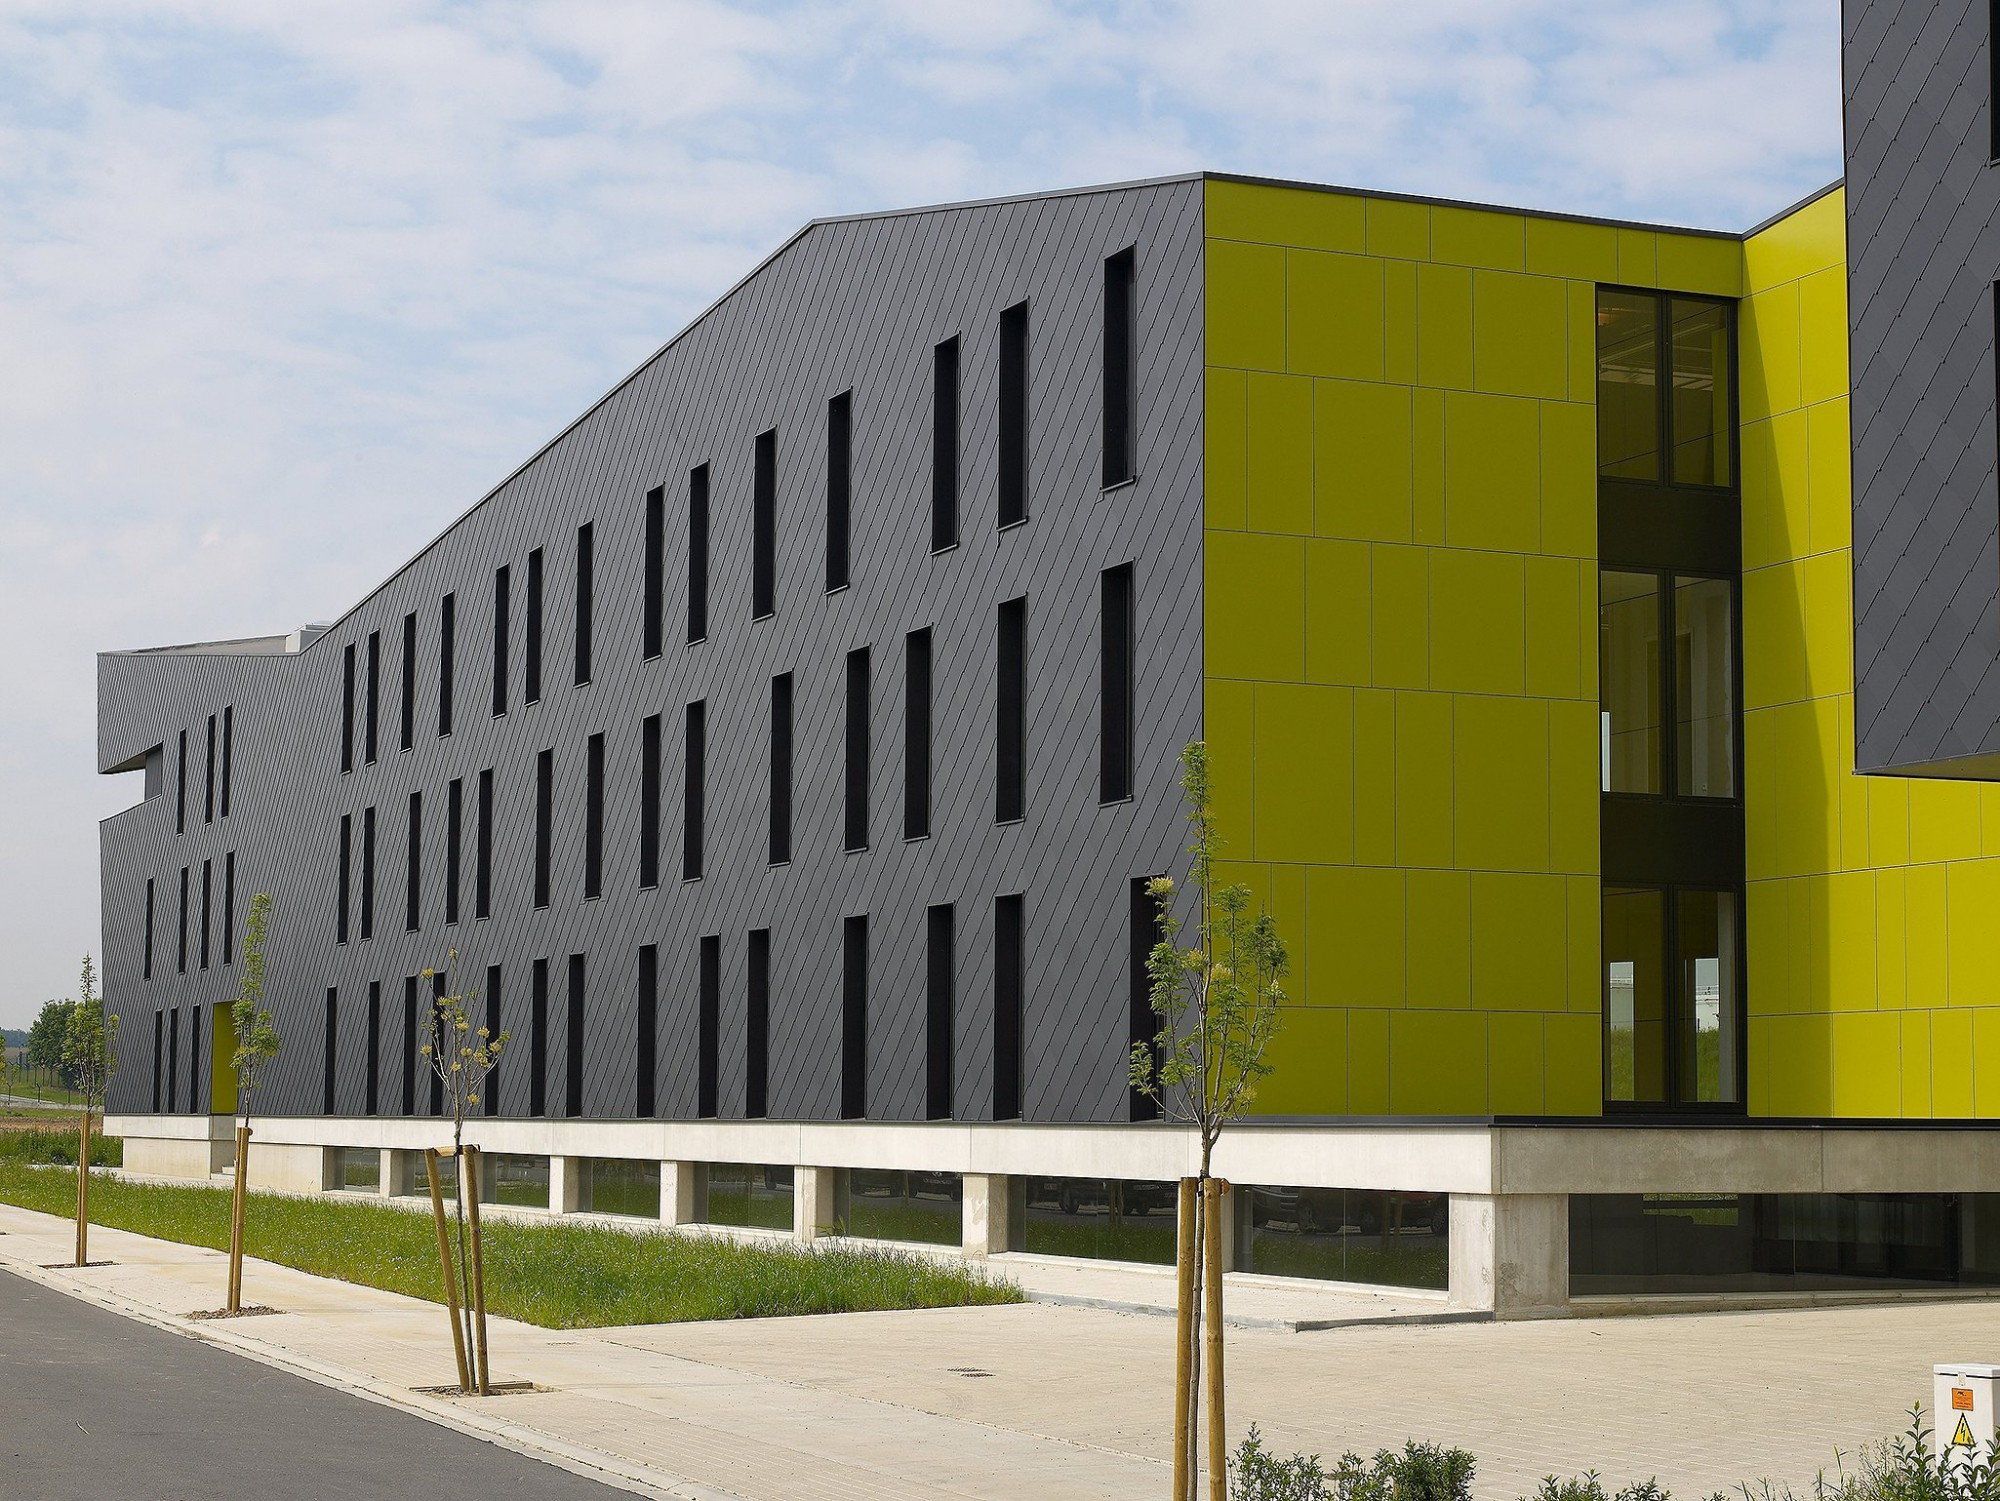 Afbeelding: Architectuur fotografie, kantoorgebouw Gate 25 L te Steenokkerzeel, voor groep Van Roey.